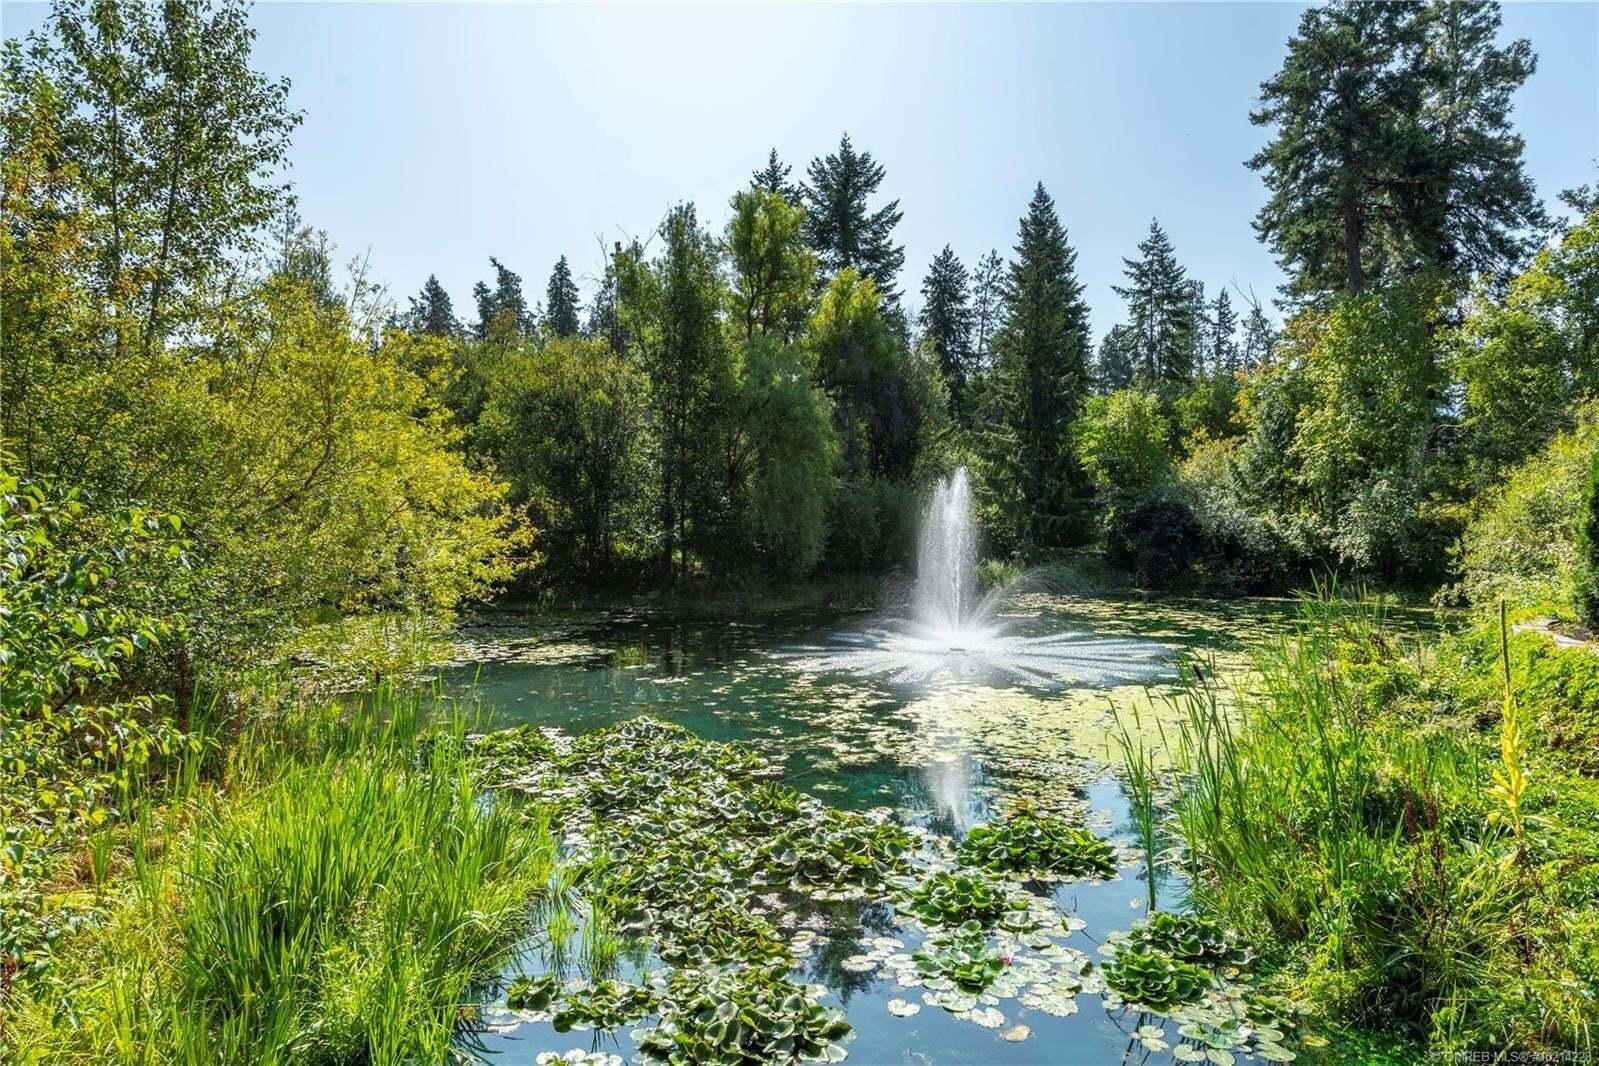 Residential property for sale at 2475 Maquinna Rd Kelowna British Columbia - MLS: 10214228